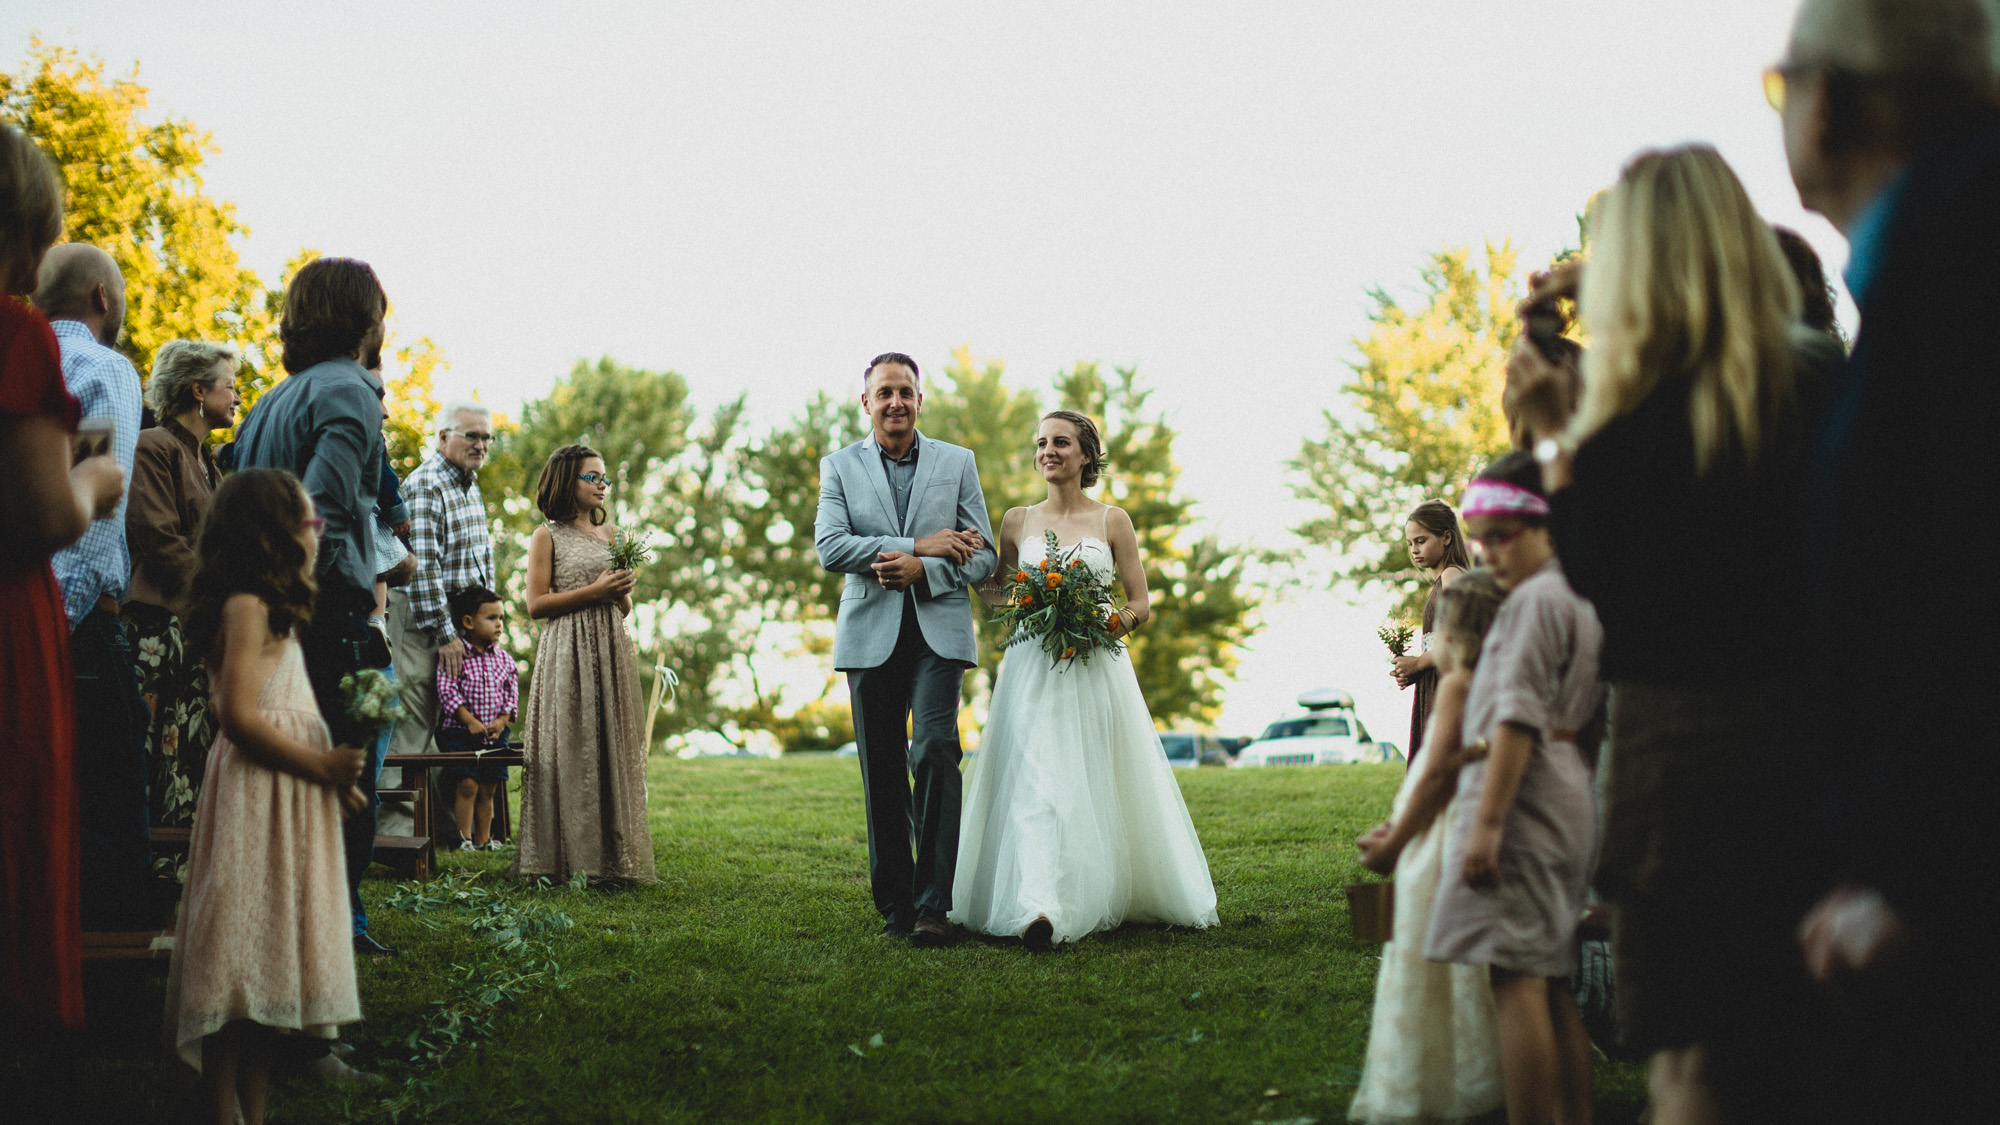 alec_vanderboom_springfield_missouri_wedding-0063.jpg